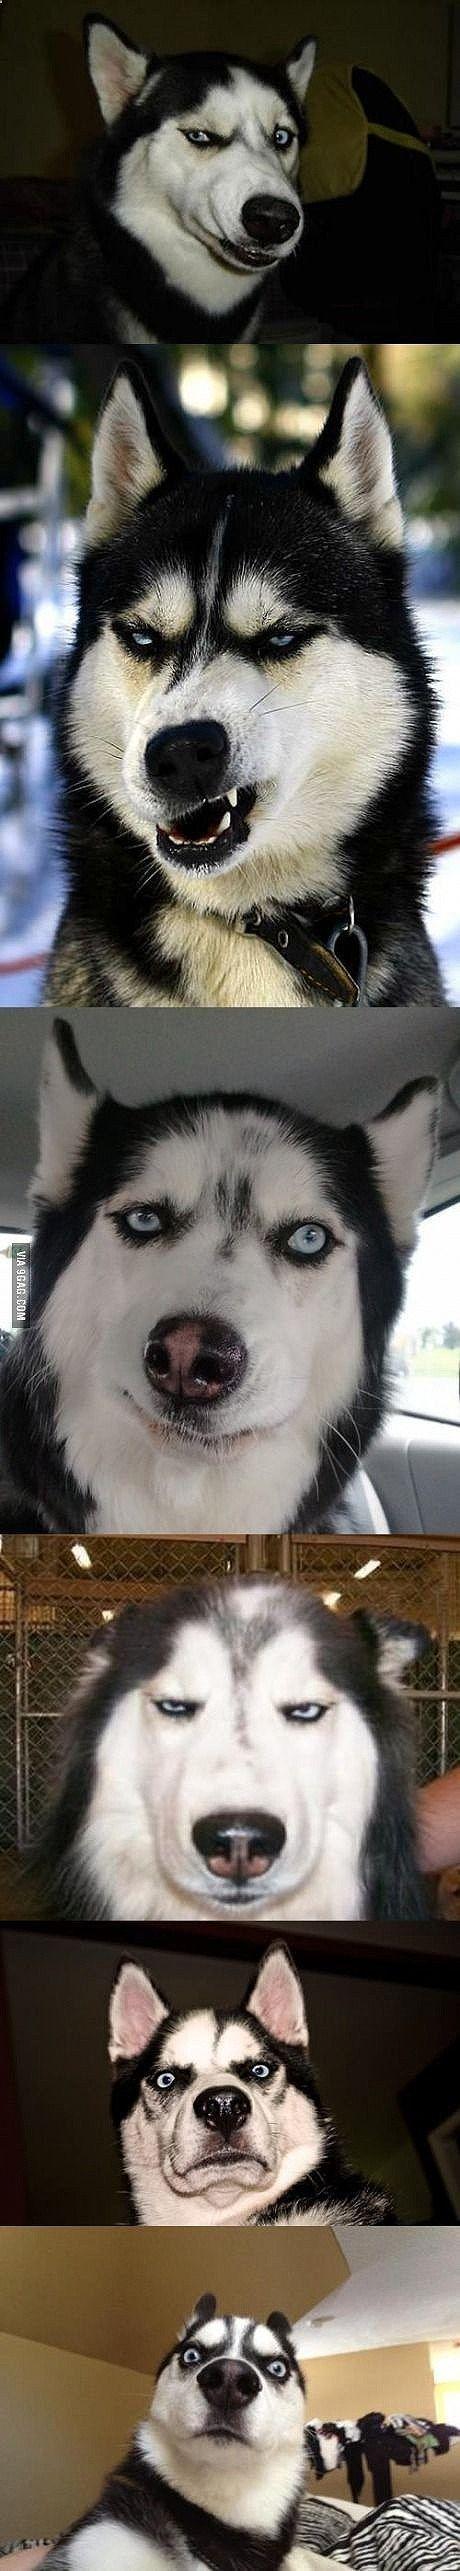 Husky funny faces